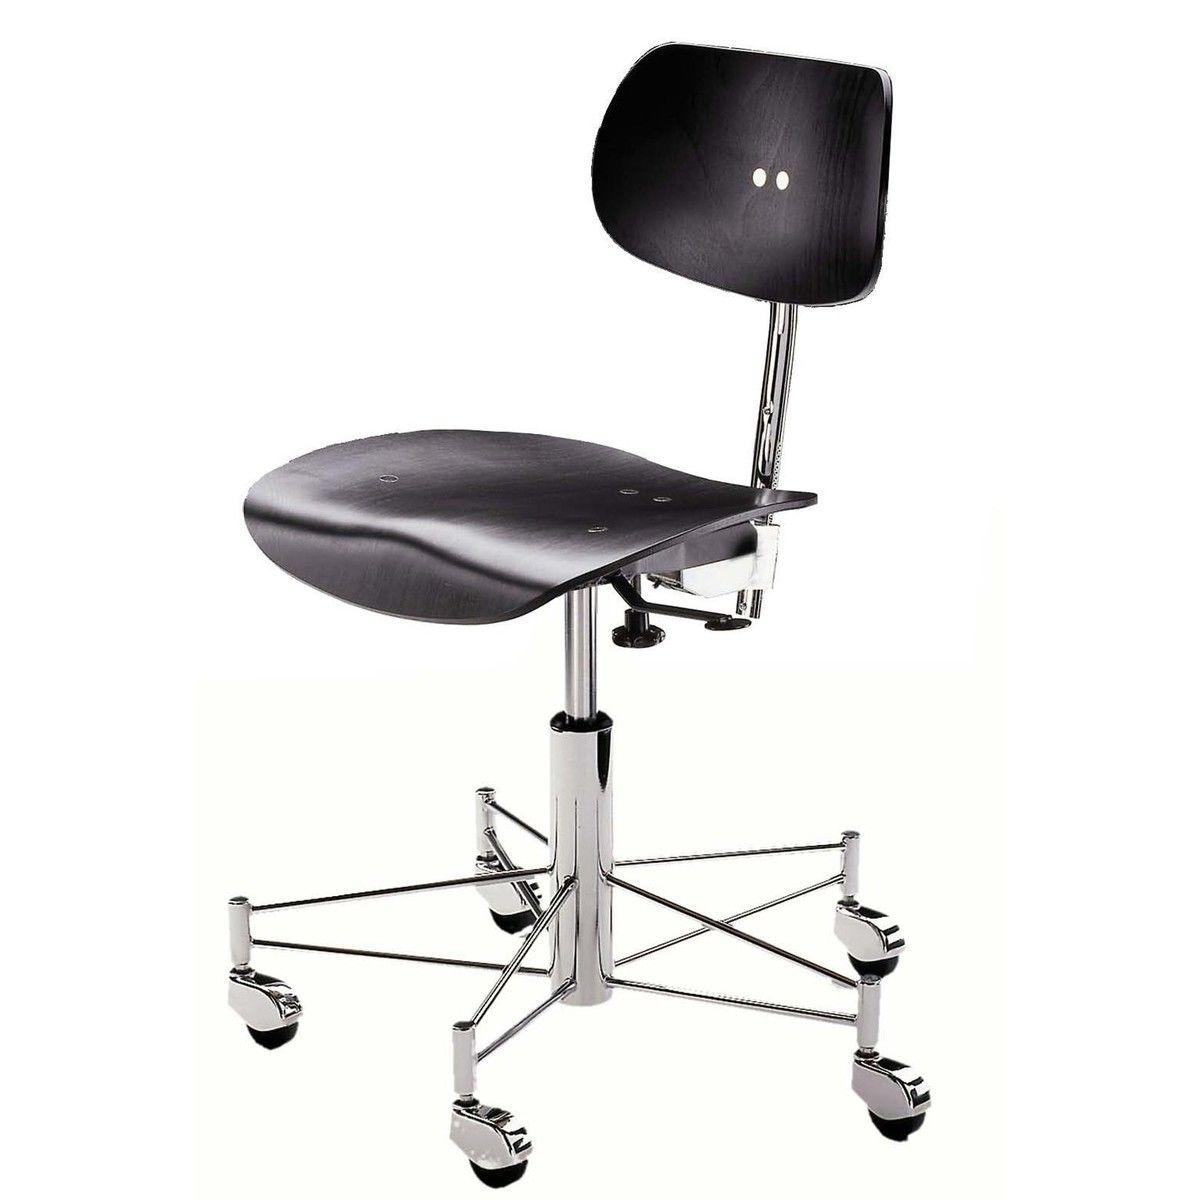 sbg 197 r swivel chair wilde spieth. Black Bedroom Furniture Sets. Home Design Ideas